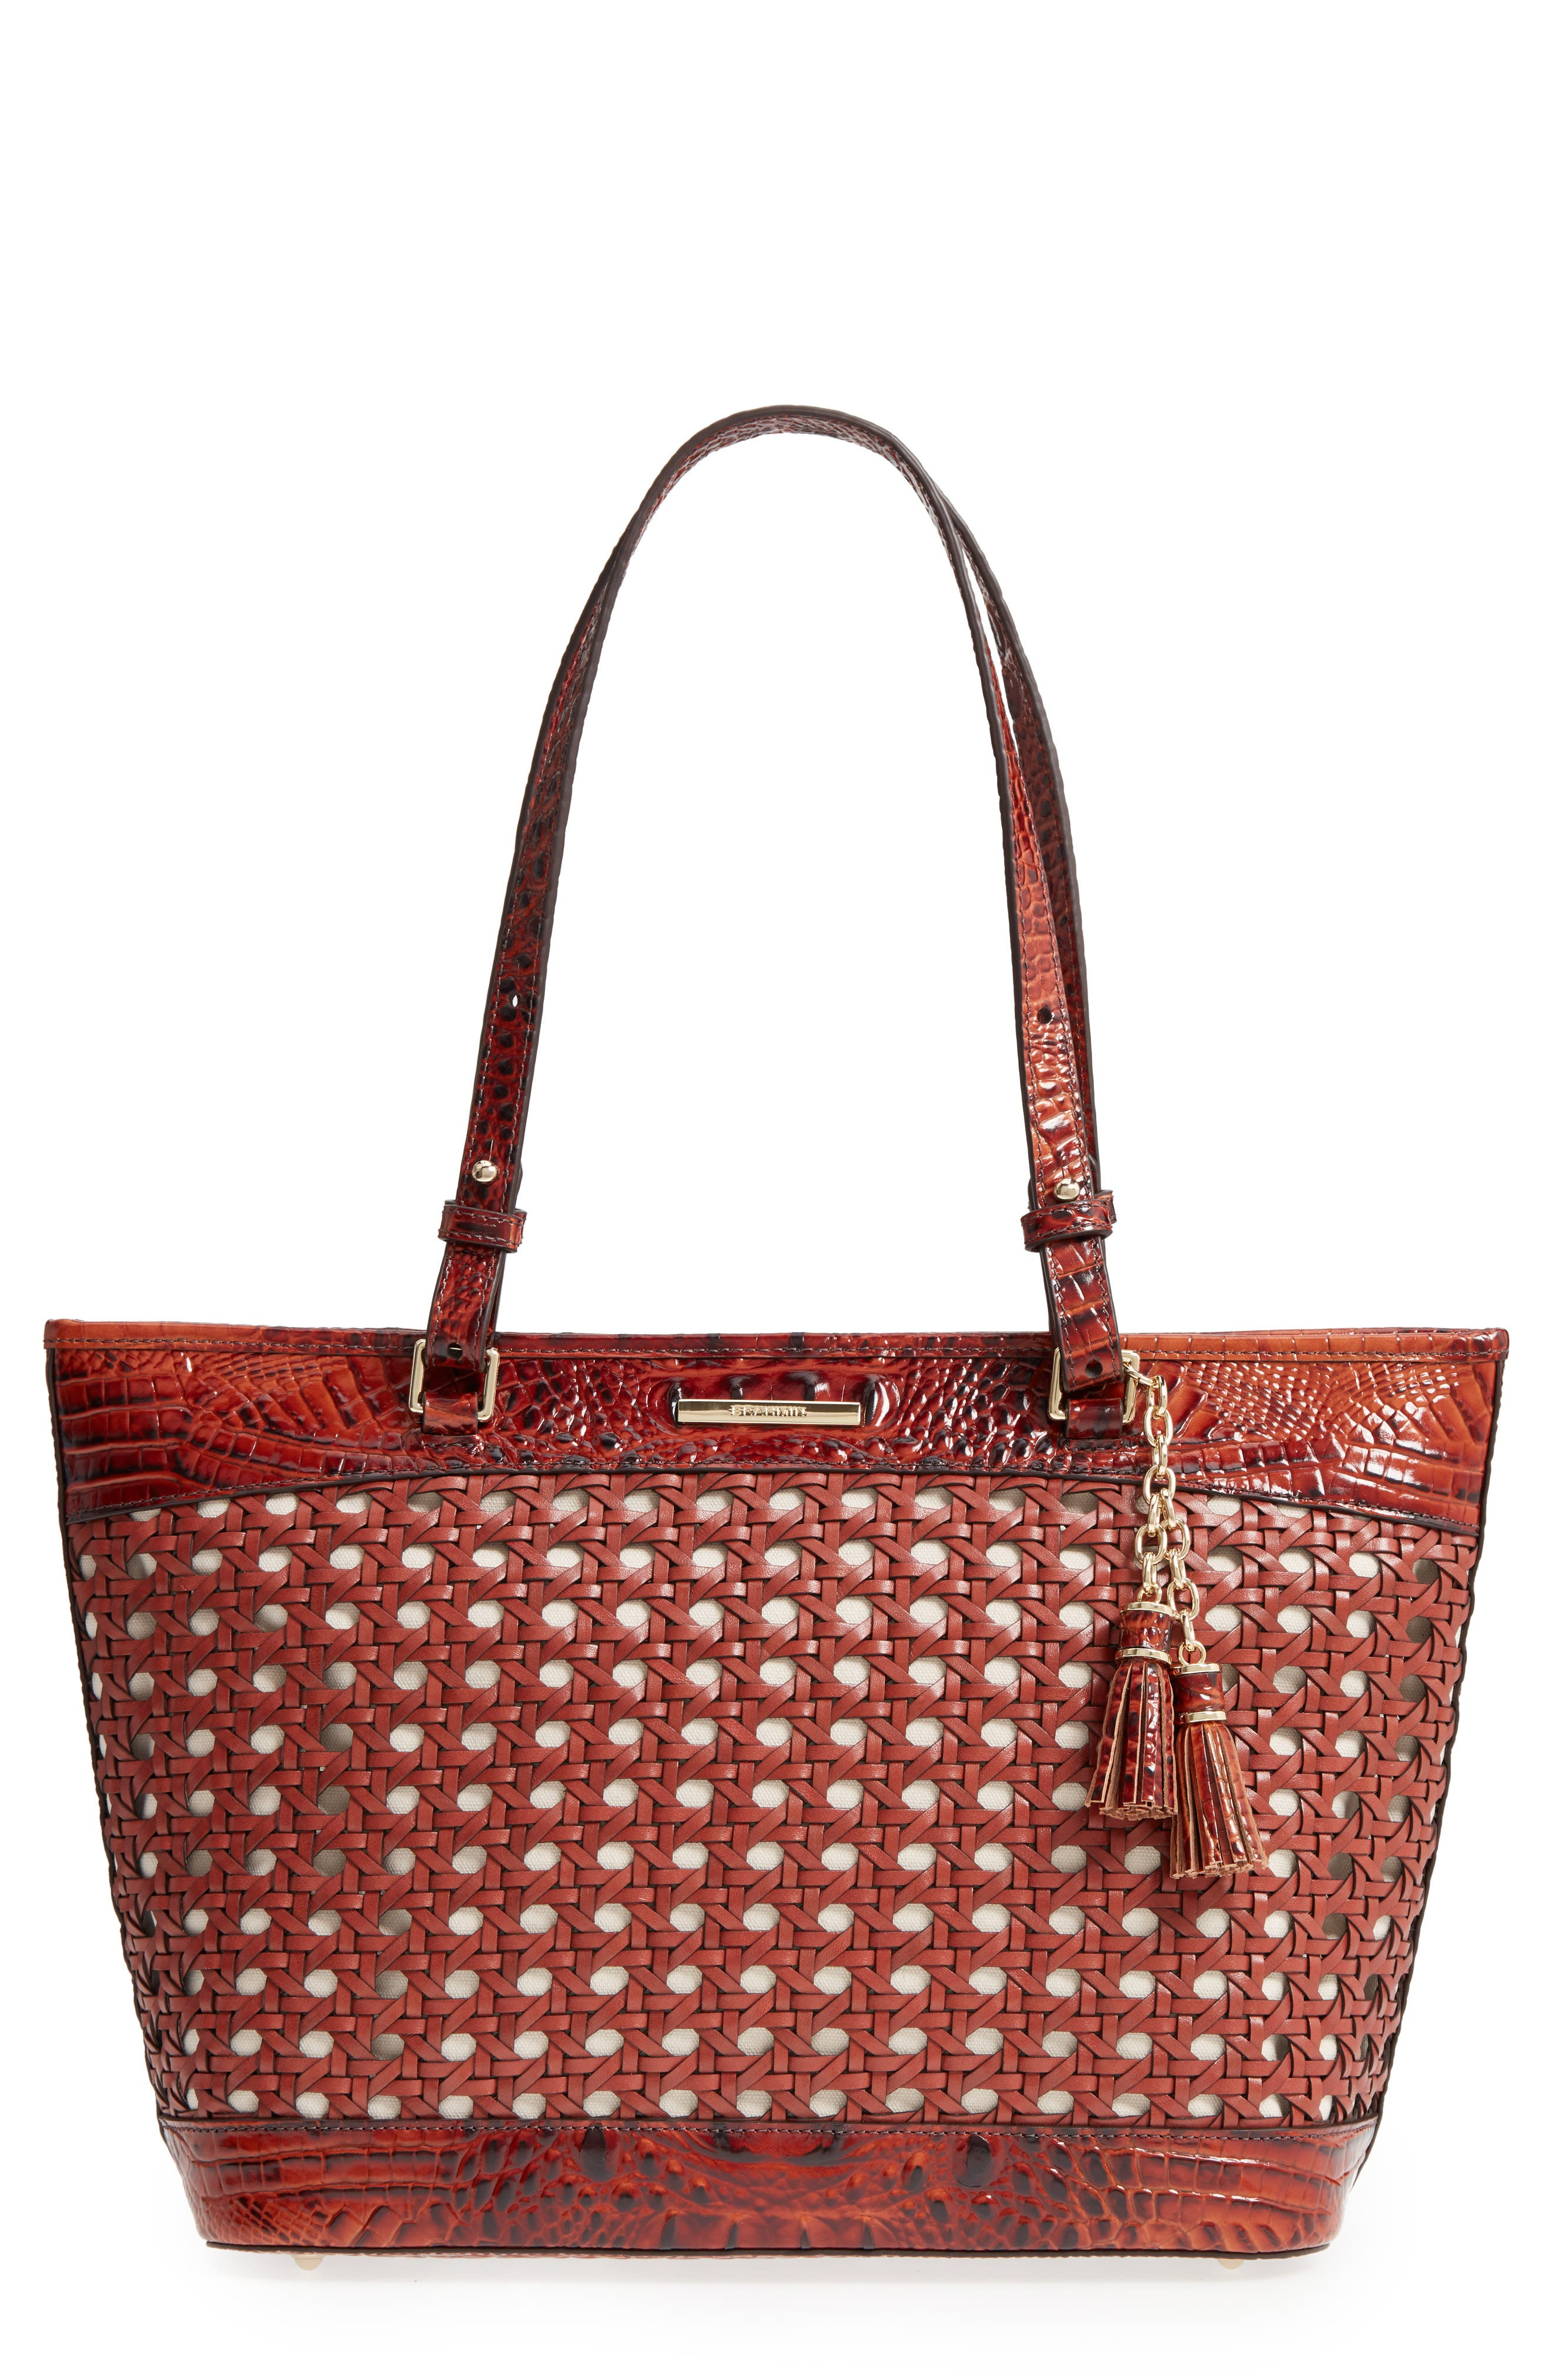 Medium Asher Leather Tote Bag,                         Main,                         color, Pecan